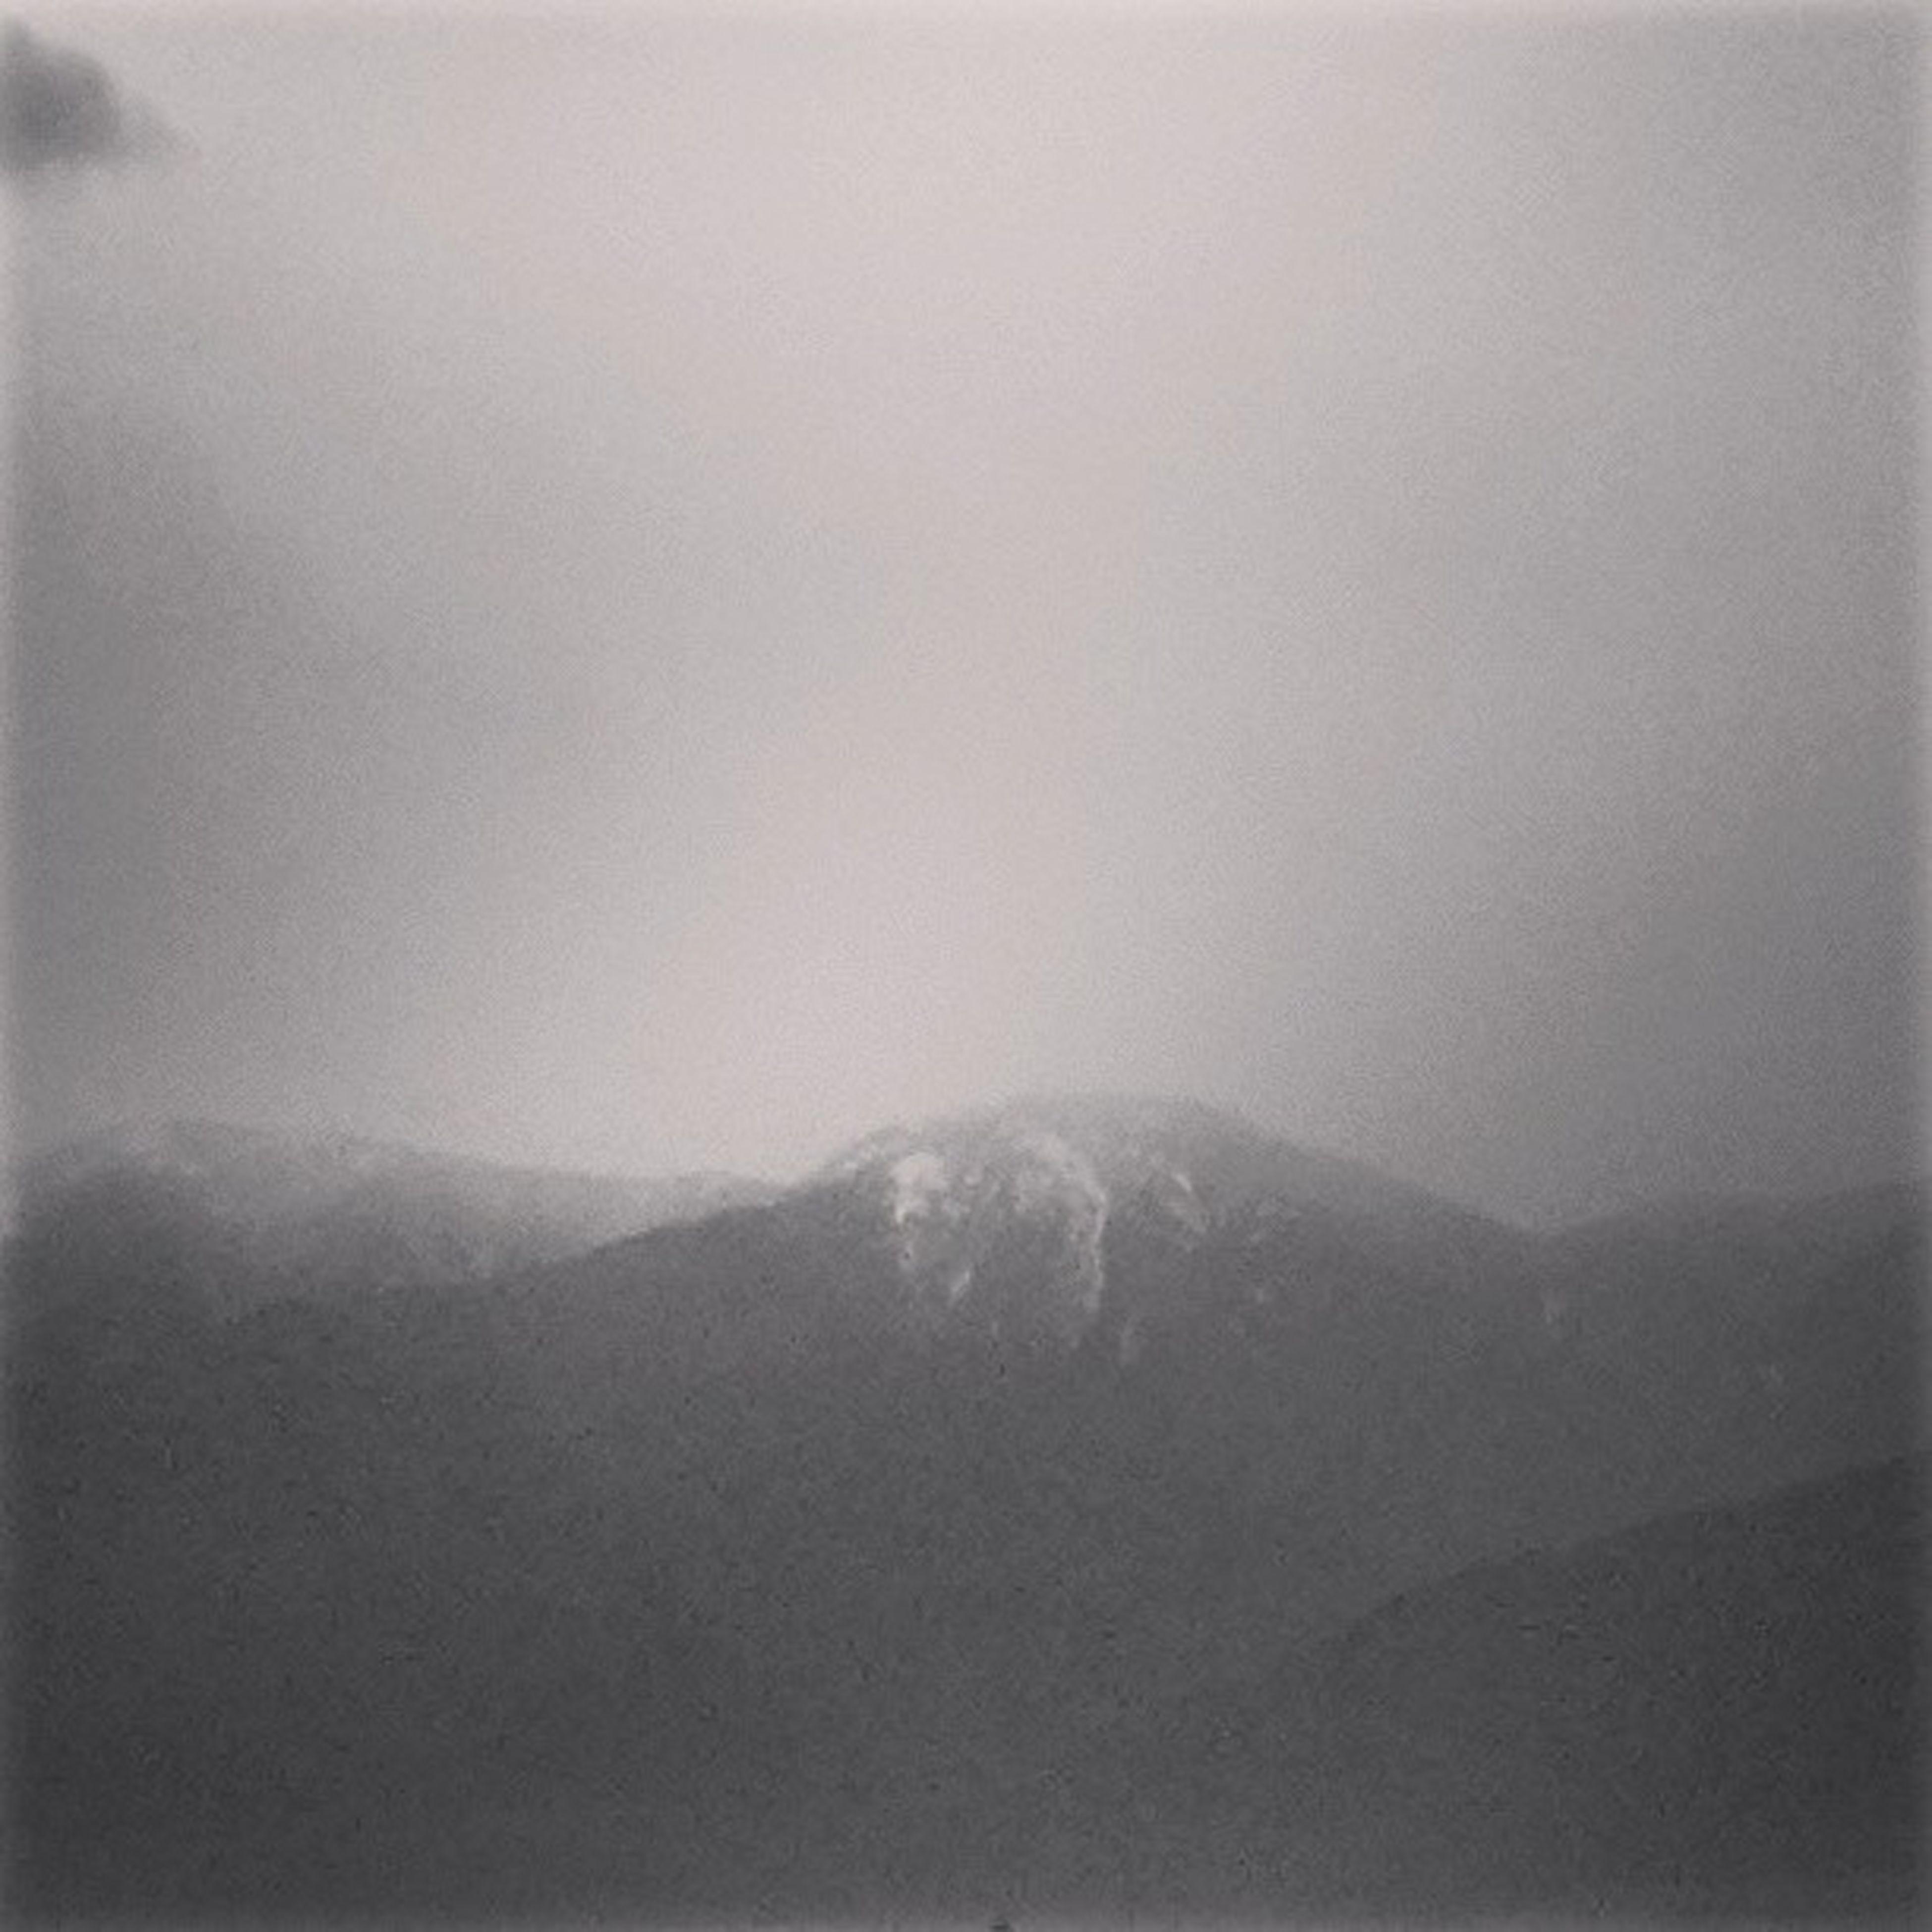 fog, weather, winter, cold temperature, mountain, scenics, foggy, tranquil scene, tranquility, snow, beauty in nature, copy space, nature, season, sky, covering, idyllic, non-urban scene, landscape